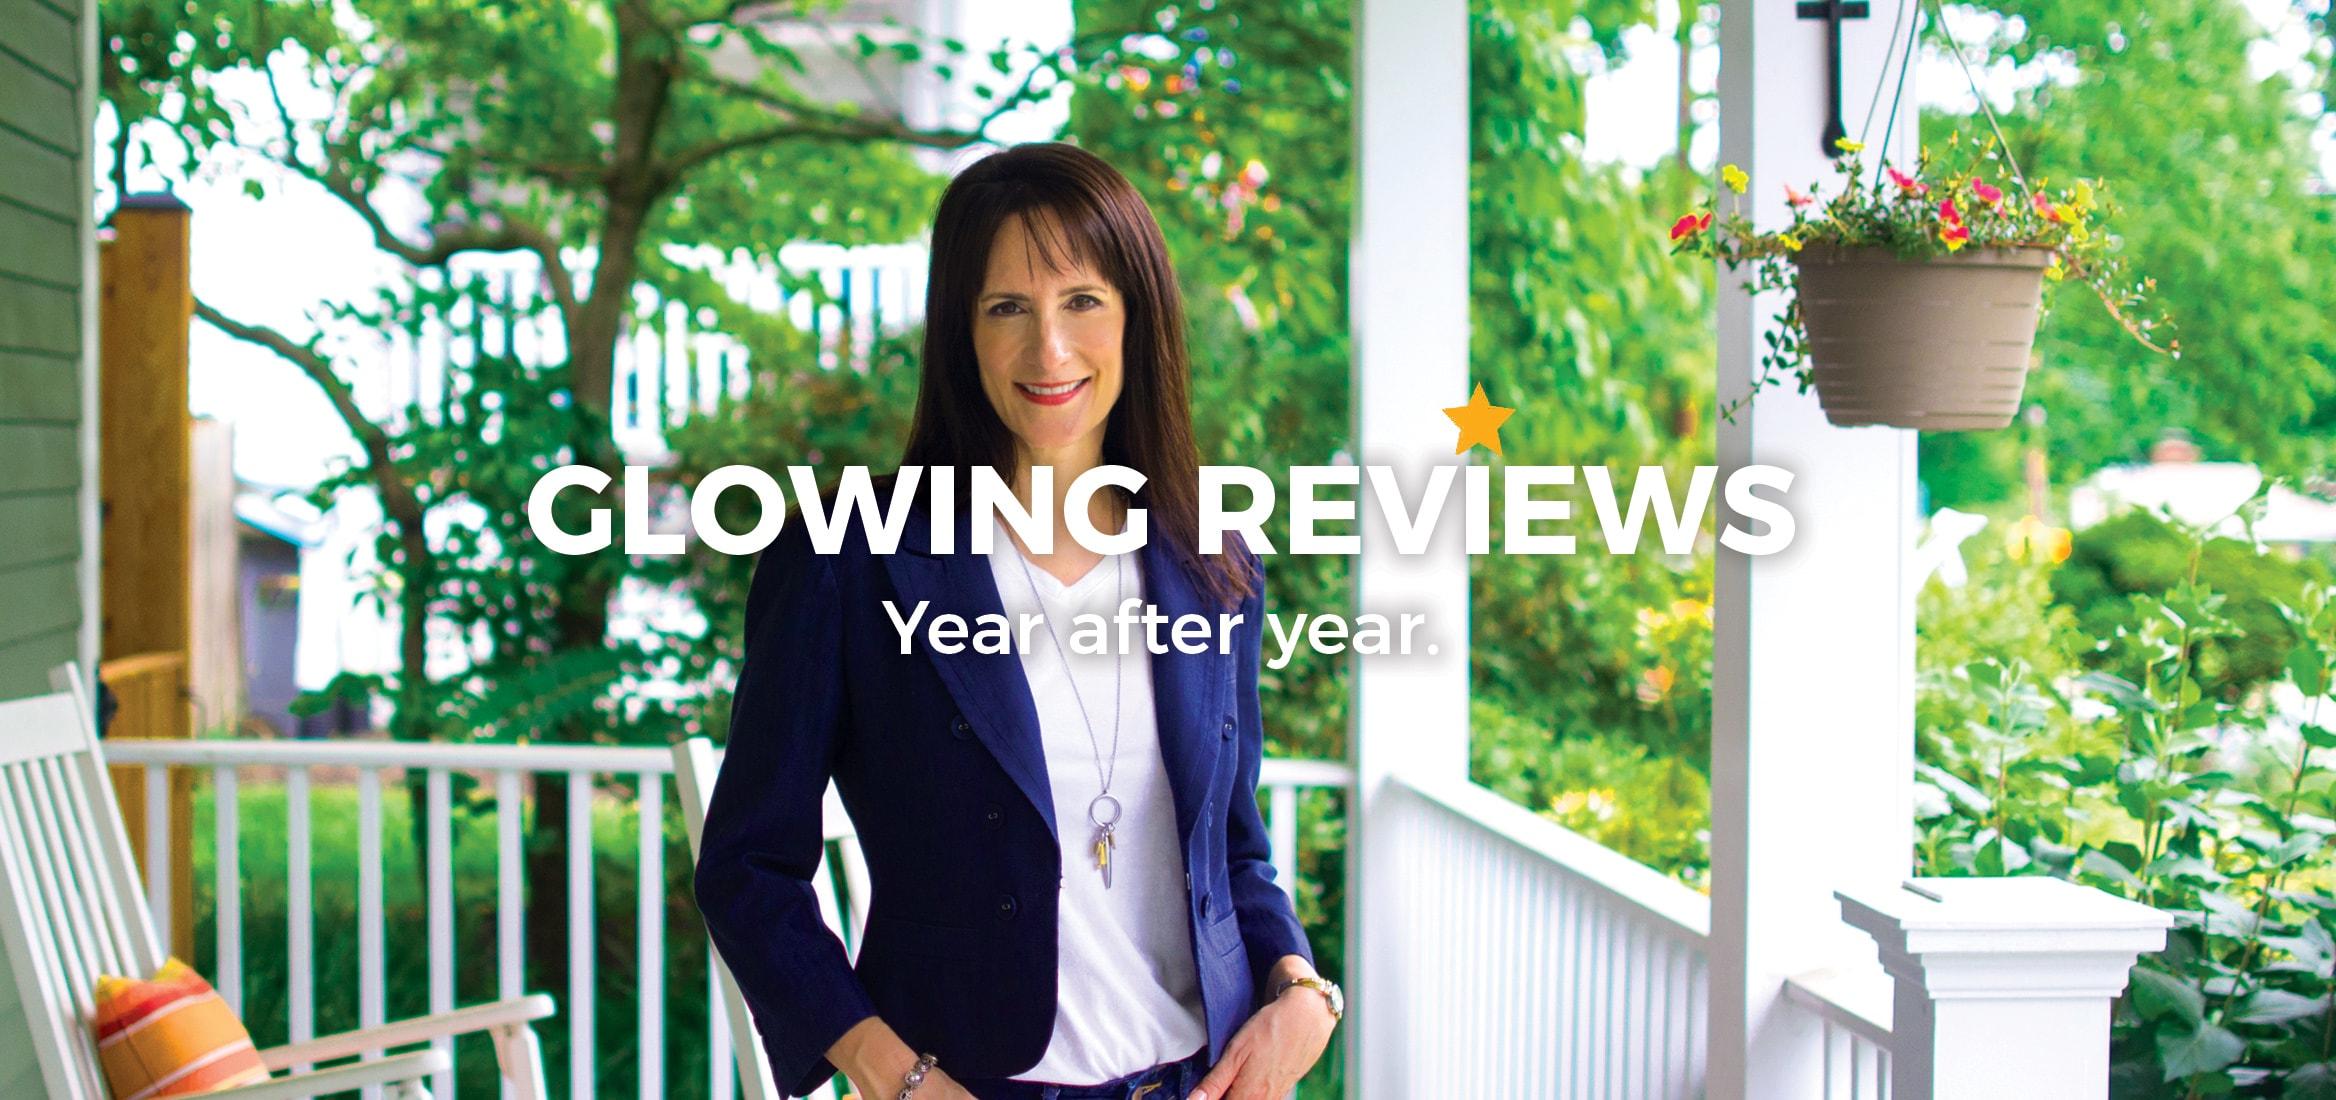 Top Arlington Virginia realtor five star reviews for Meg Ross